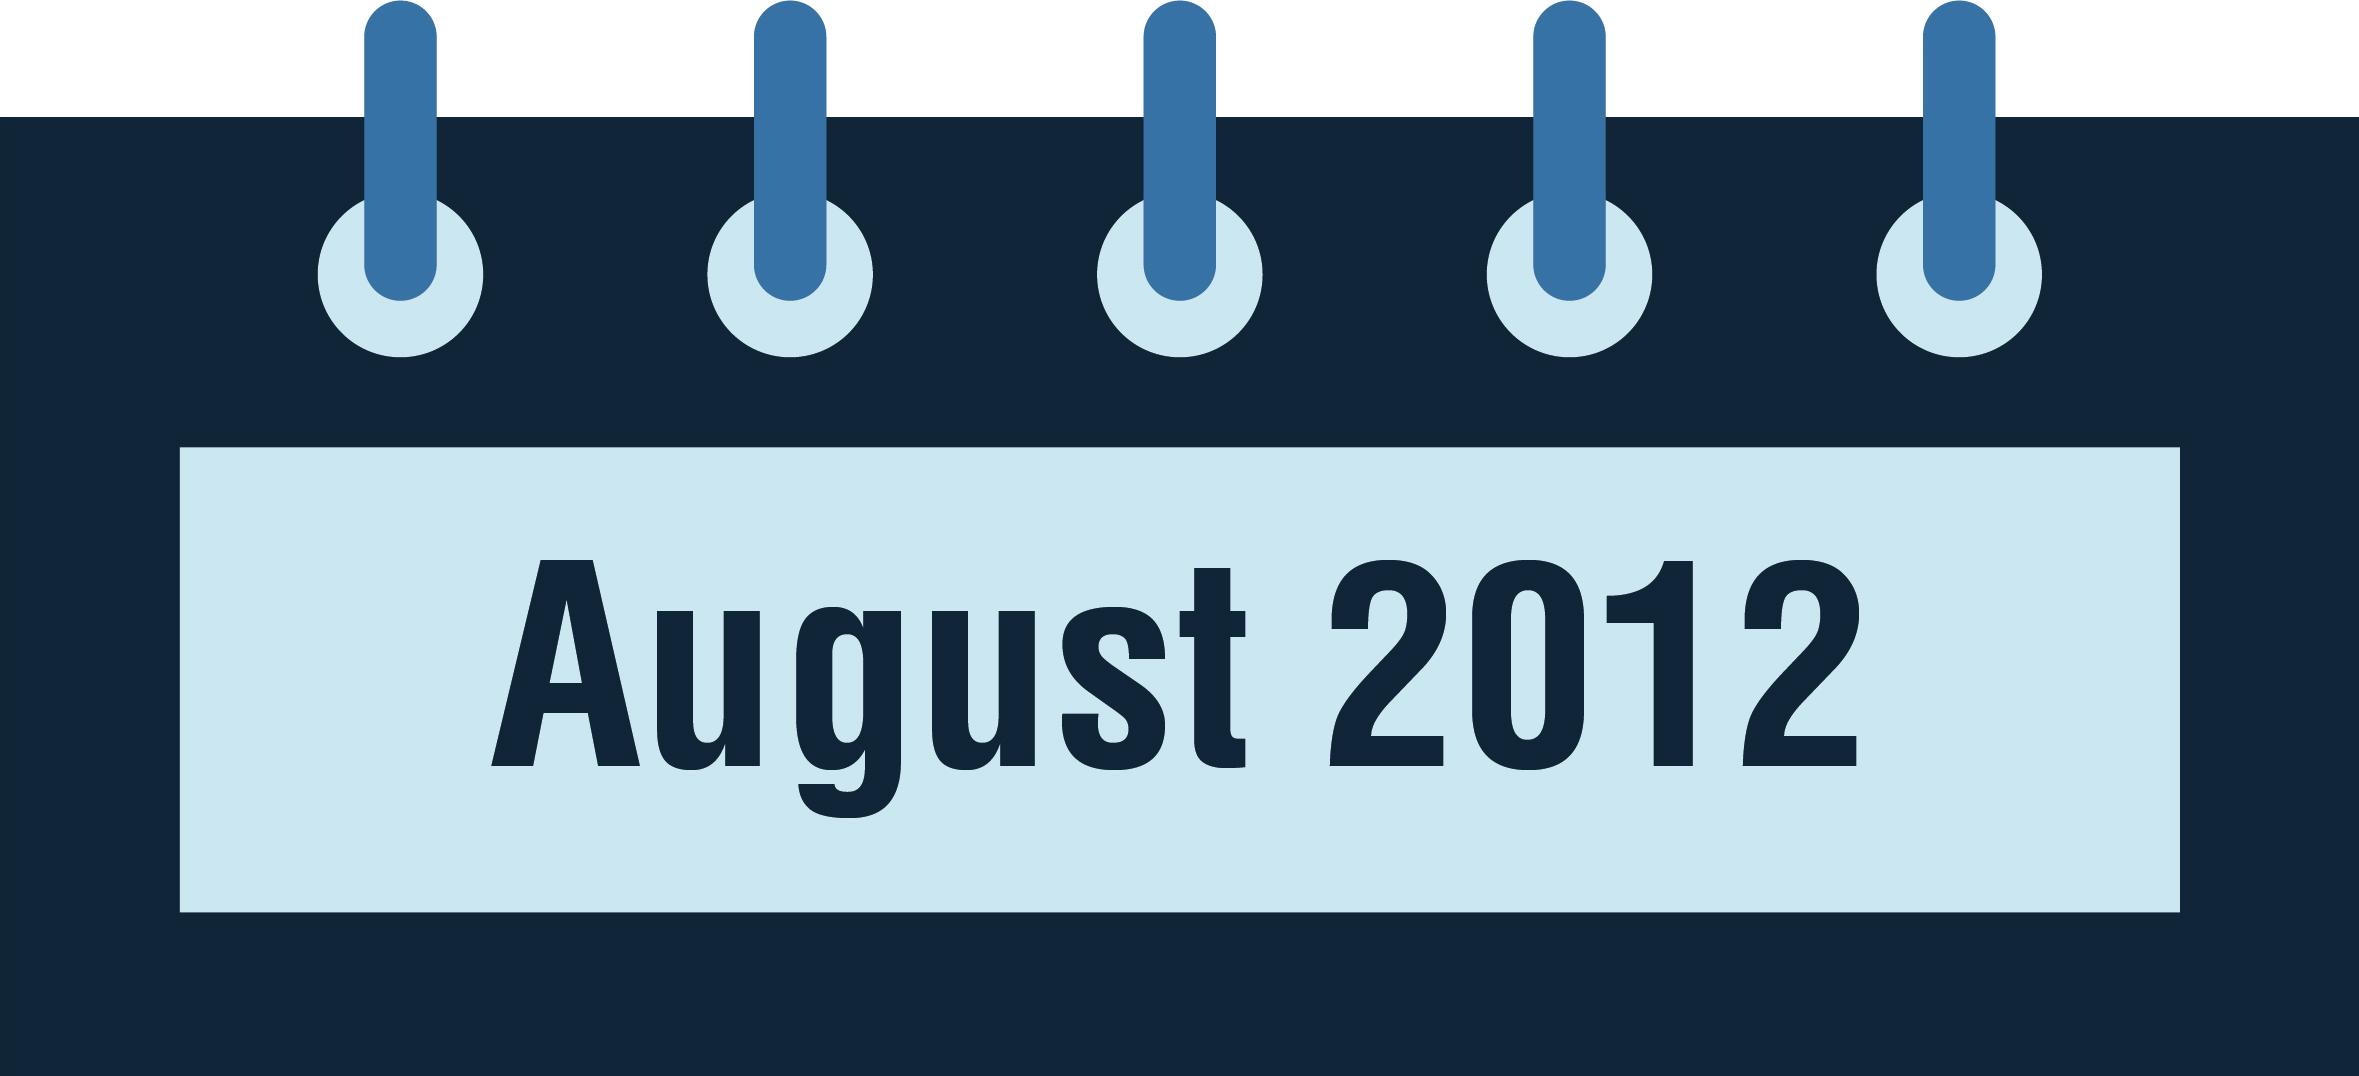 NeuroCheck History - August 2012 (Image © NeuroCheck)